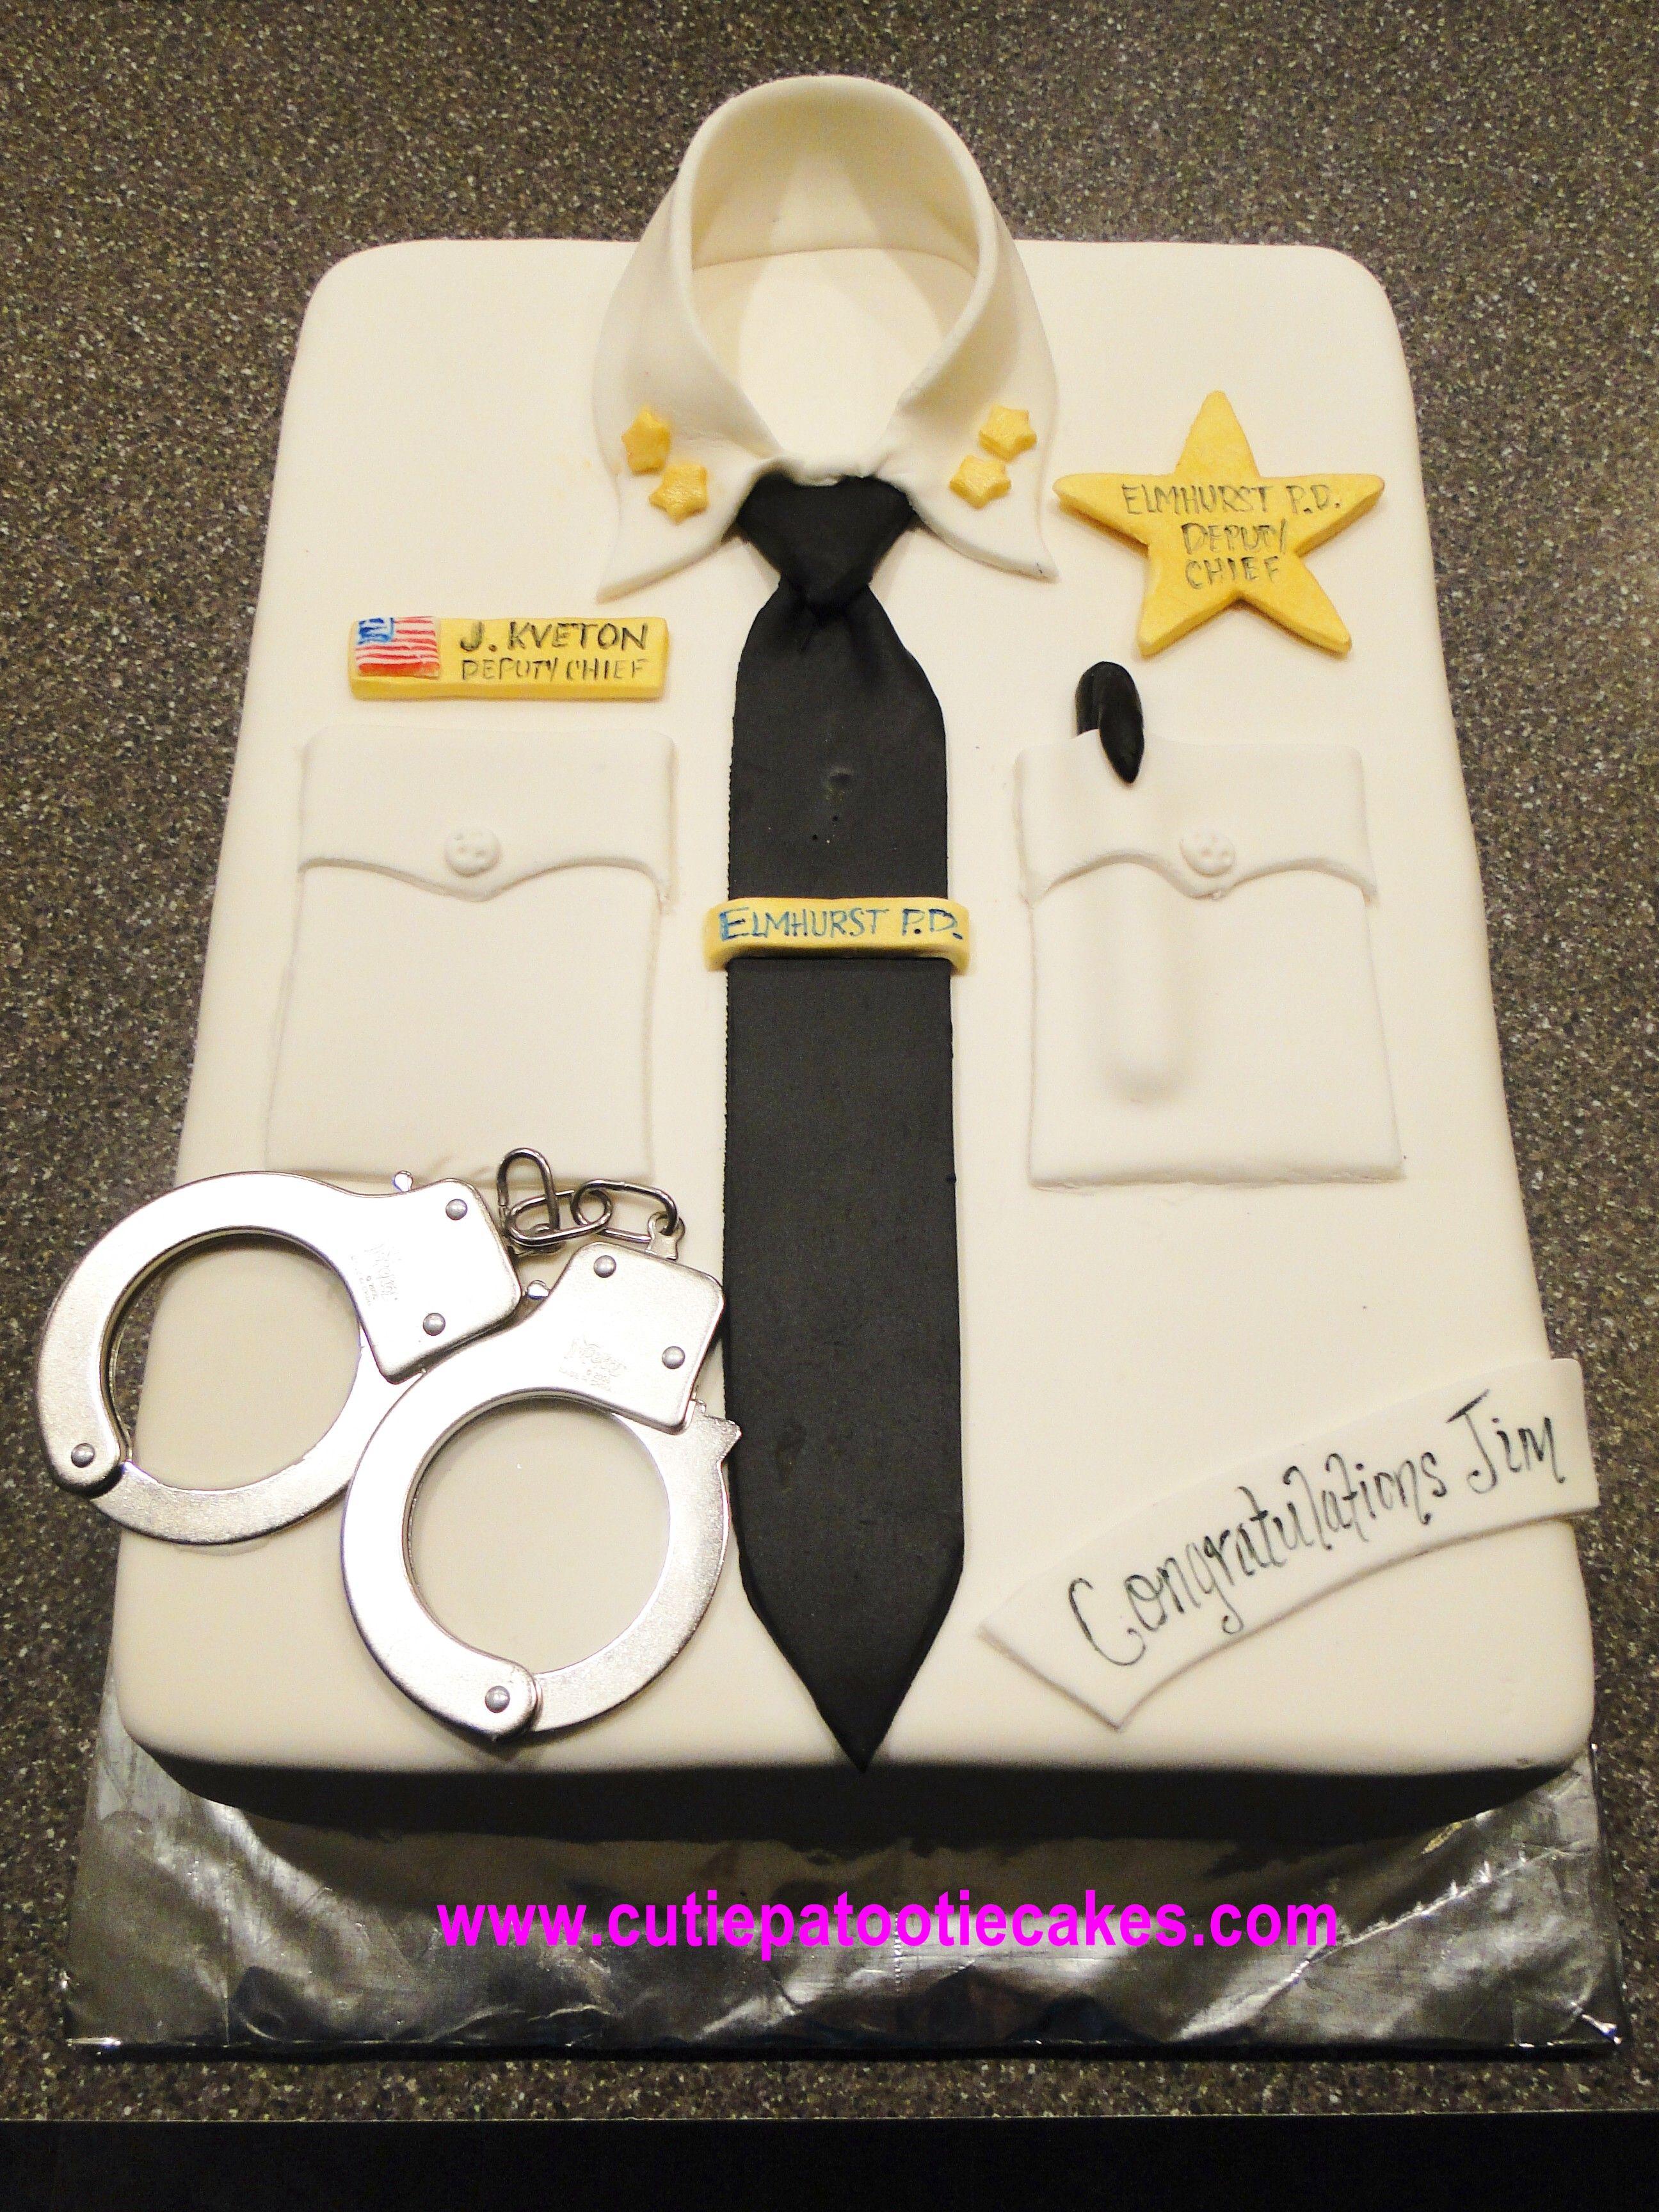 Police Shirt Cake Cakes Cupcakes And More Shirt Cake